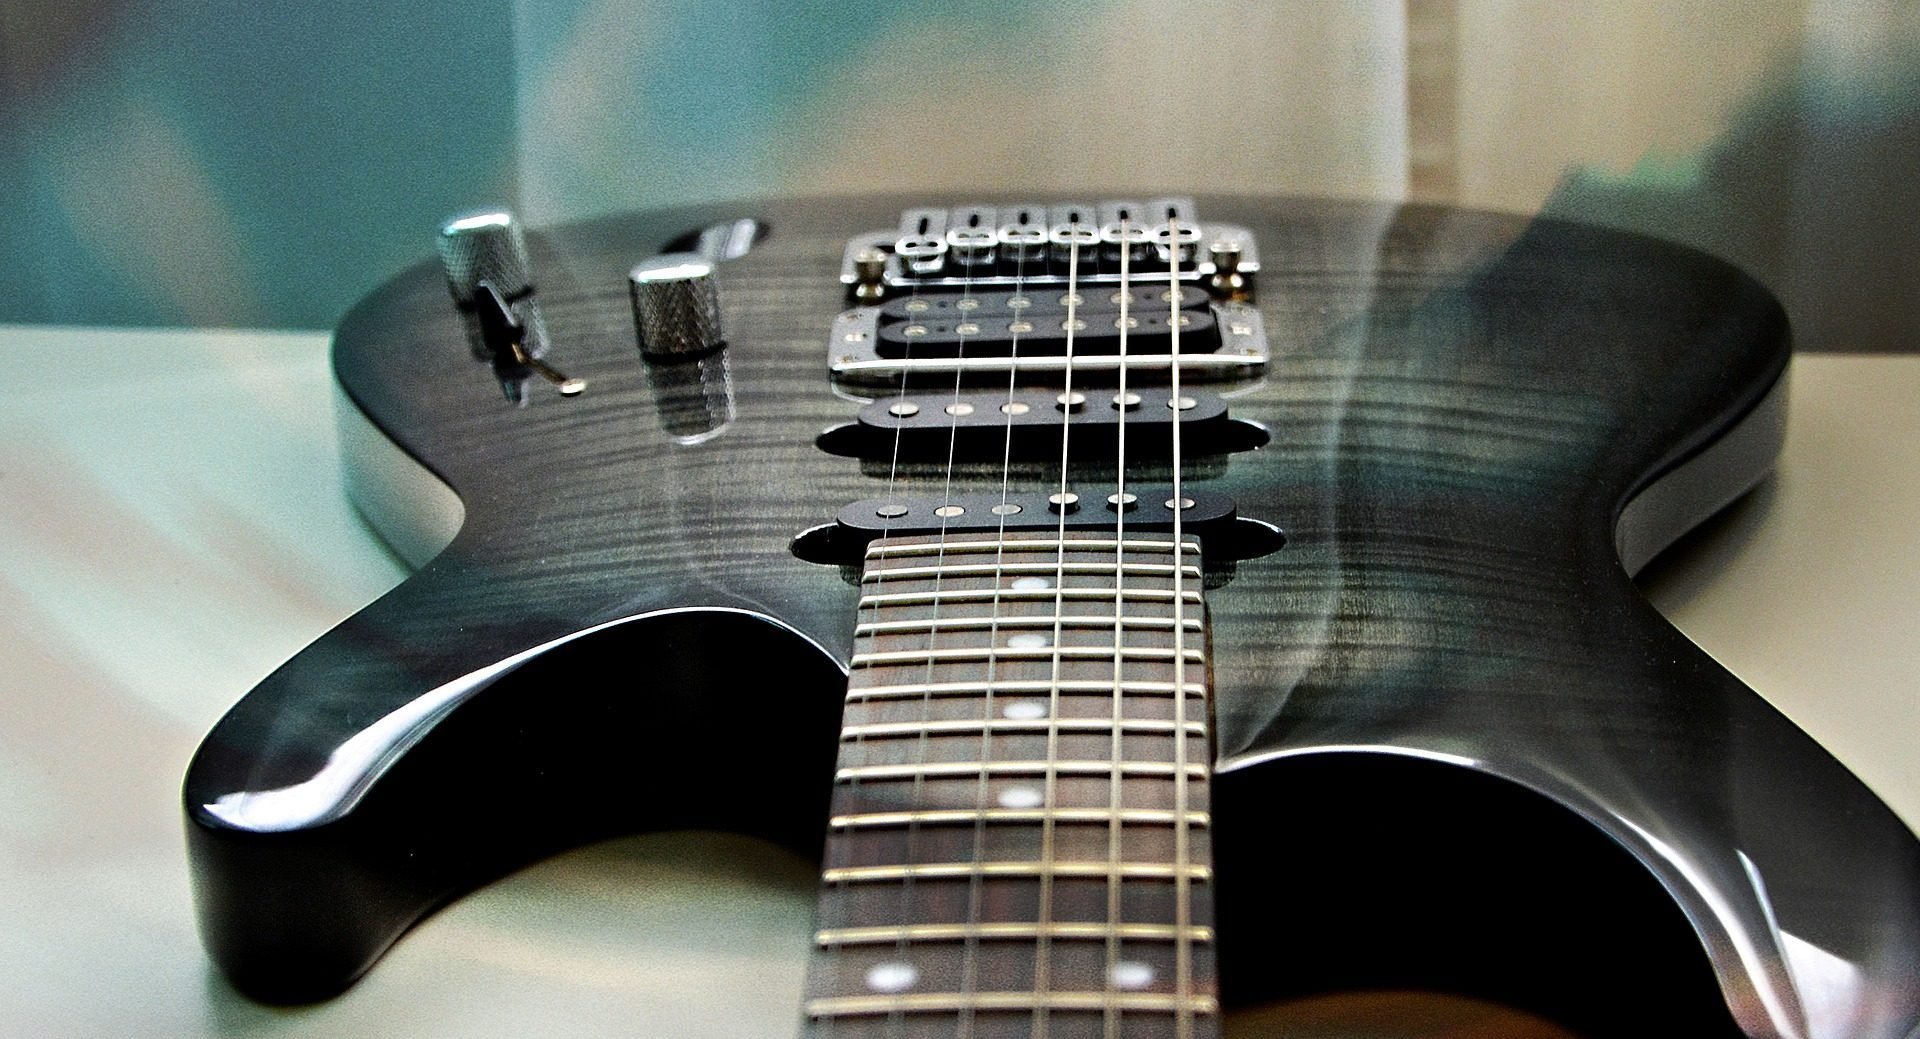 Black Electric Guitar Wallpaper In High Quality De Guitarra Electrica Yamaha Sin Fondo 296218 Hd Wallpaper Backgrounds Download